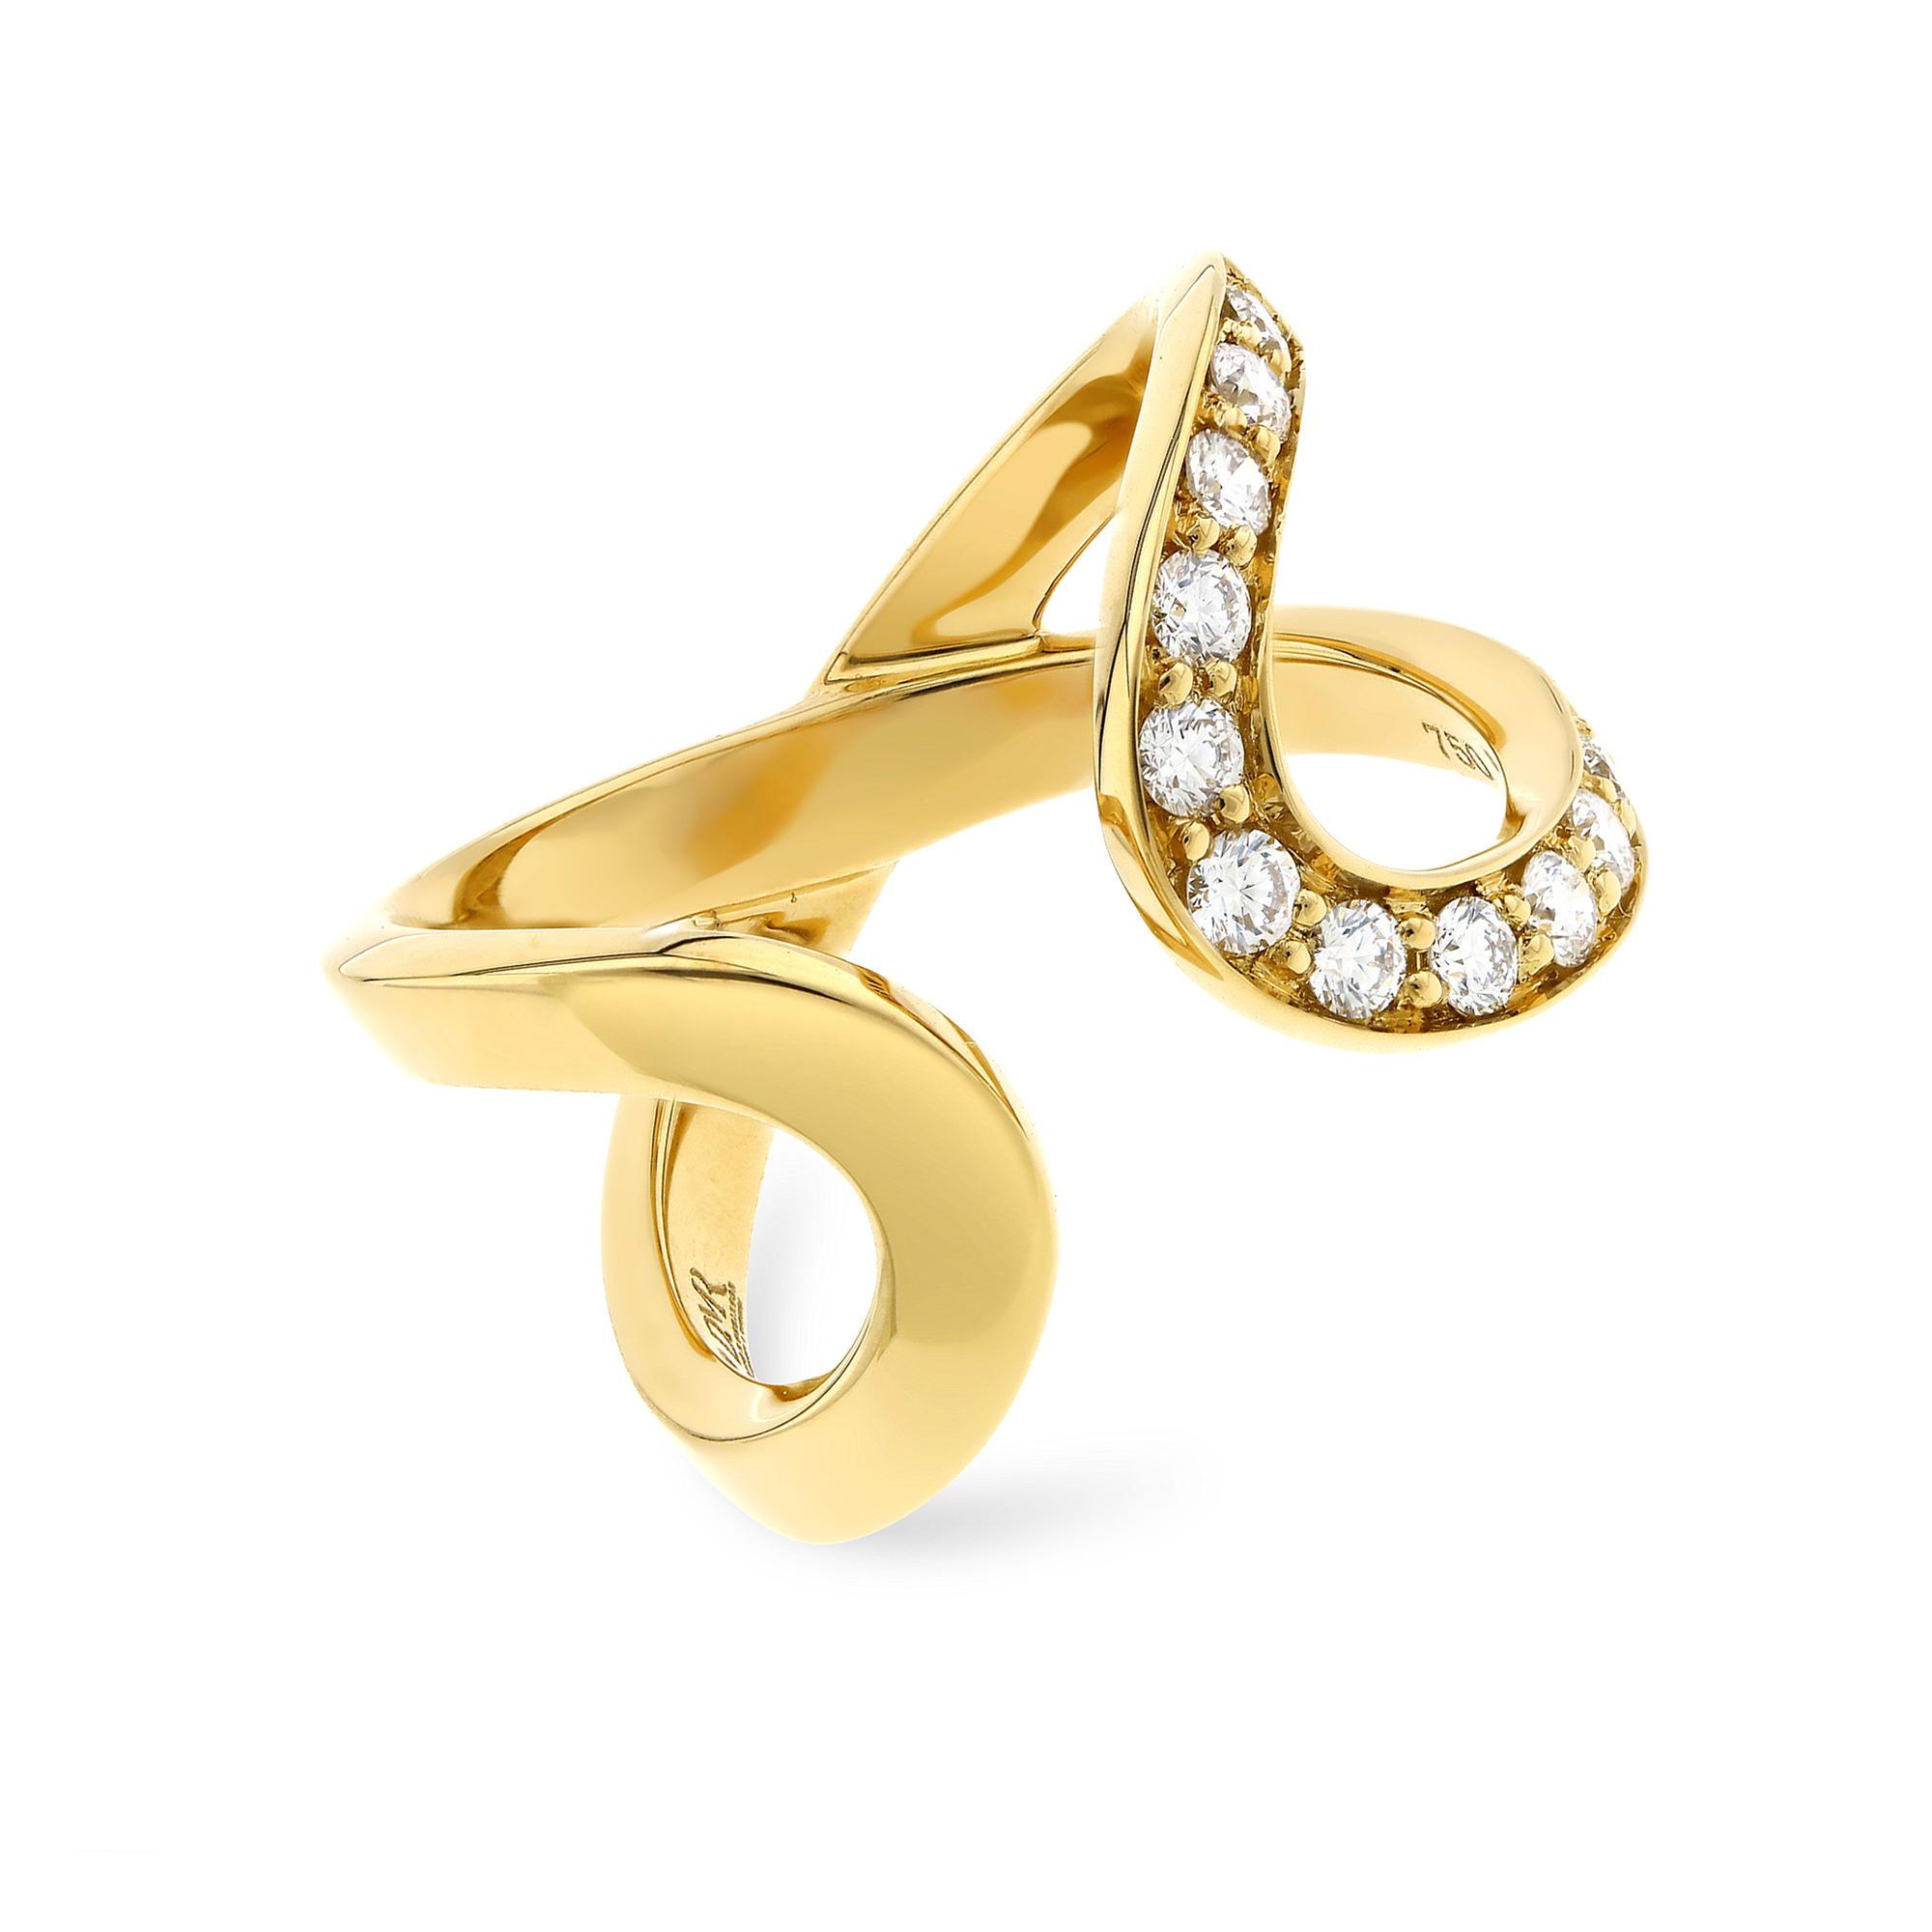 Infinity Half Set Yellow Gold Diamond Ring